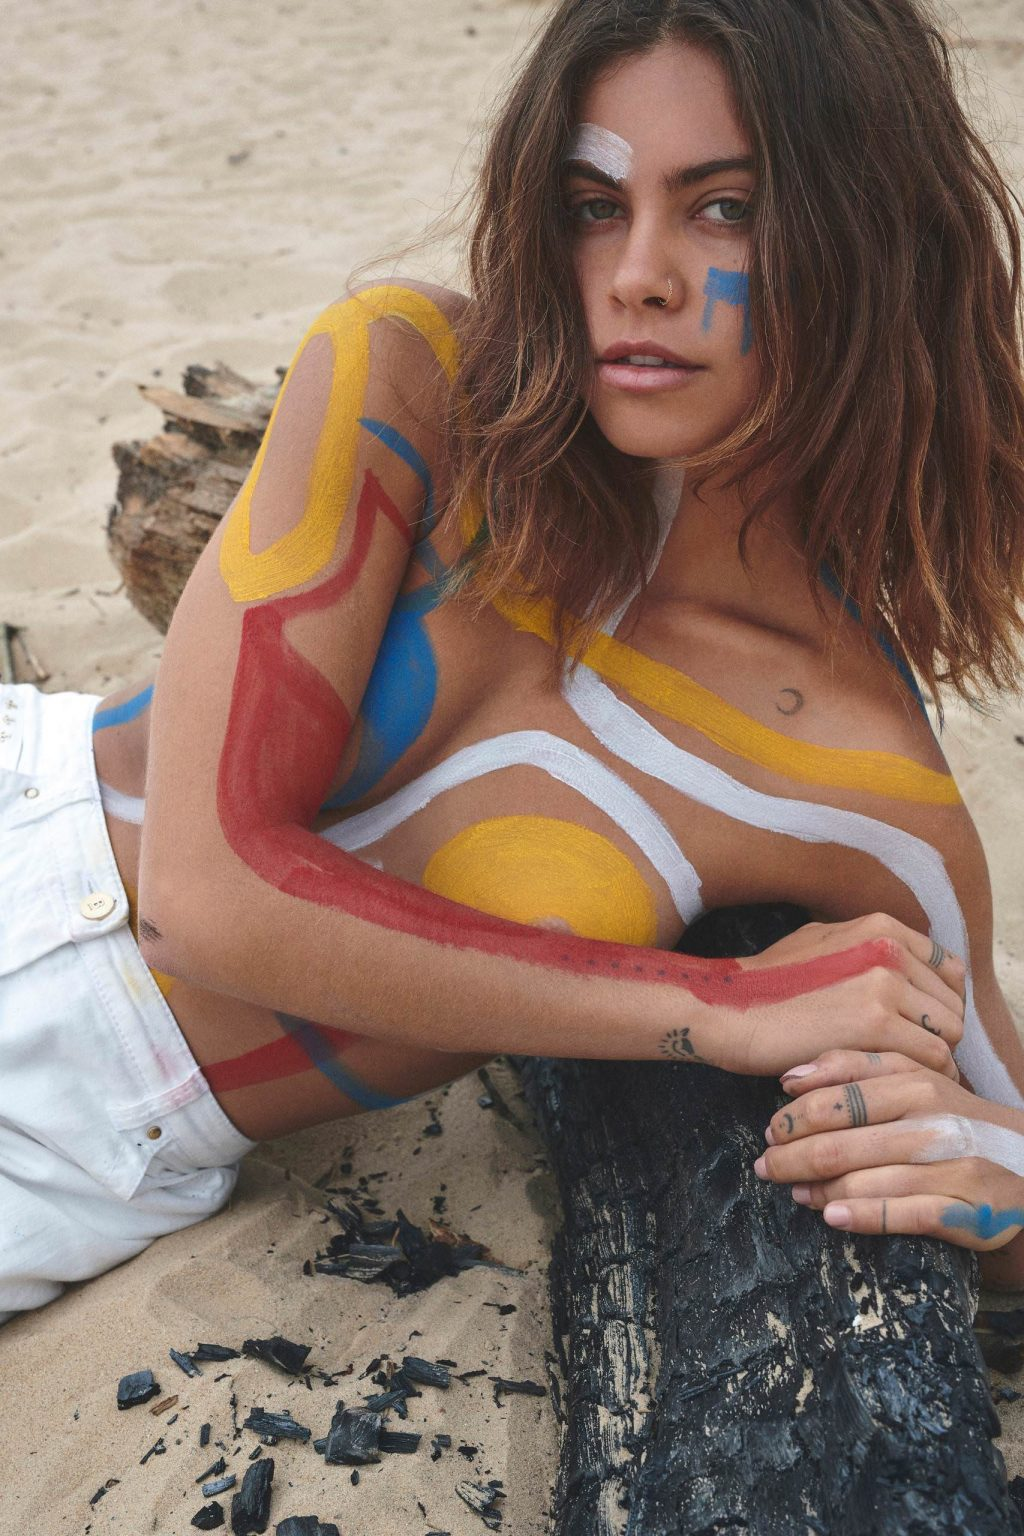 Cleavage Mimi Elashiry naked (25 foto and video), Tits, Paparazzi, Twitter, cameltoe 2017